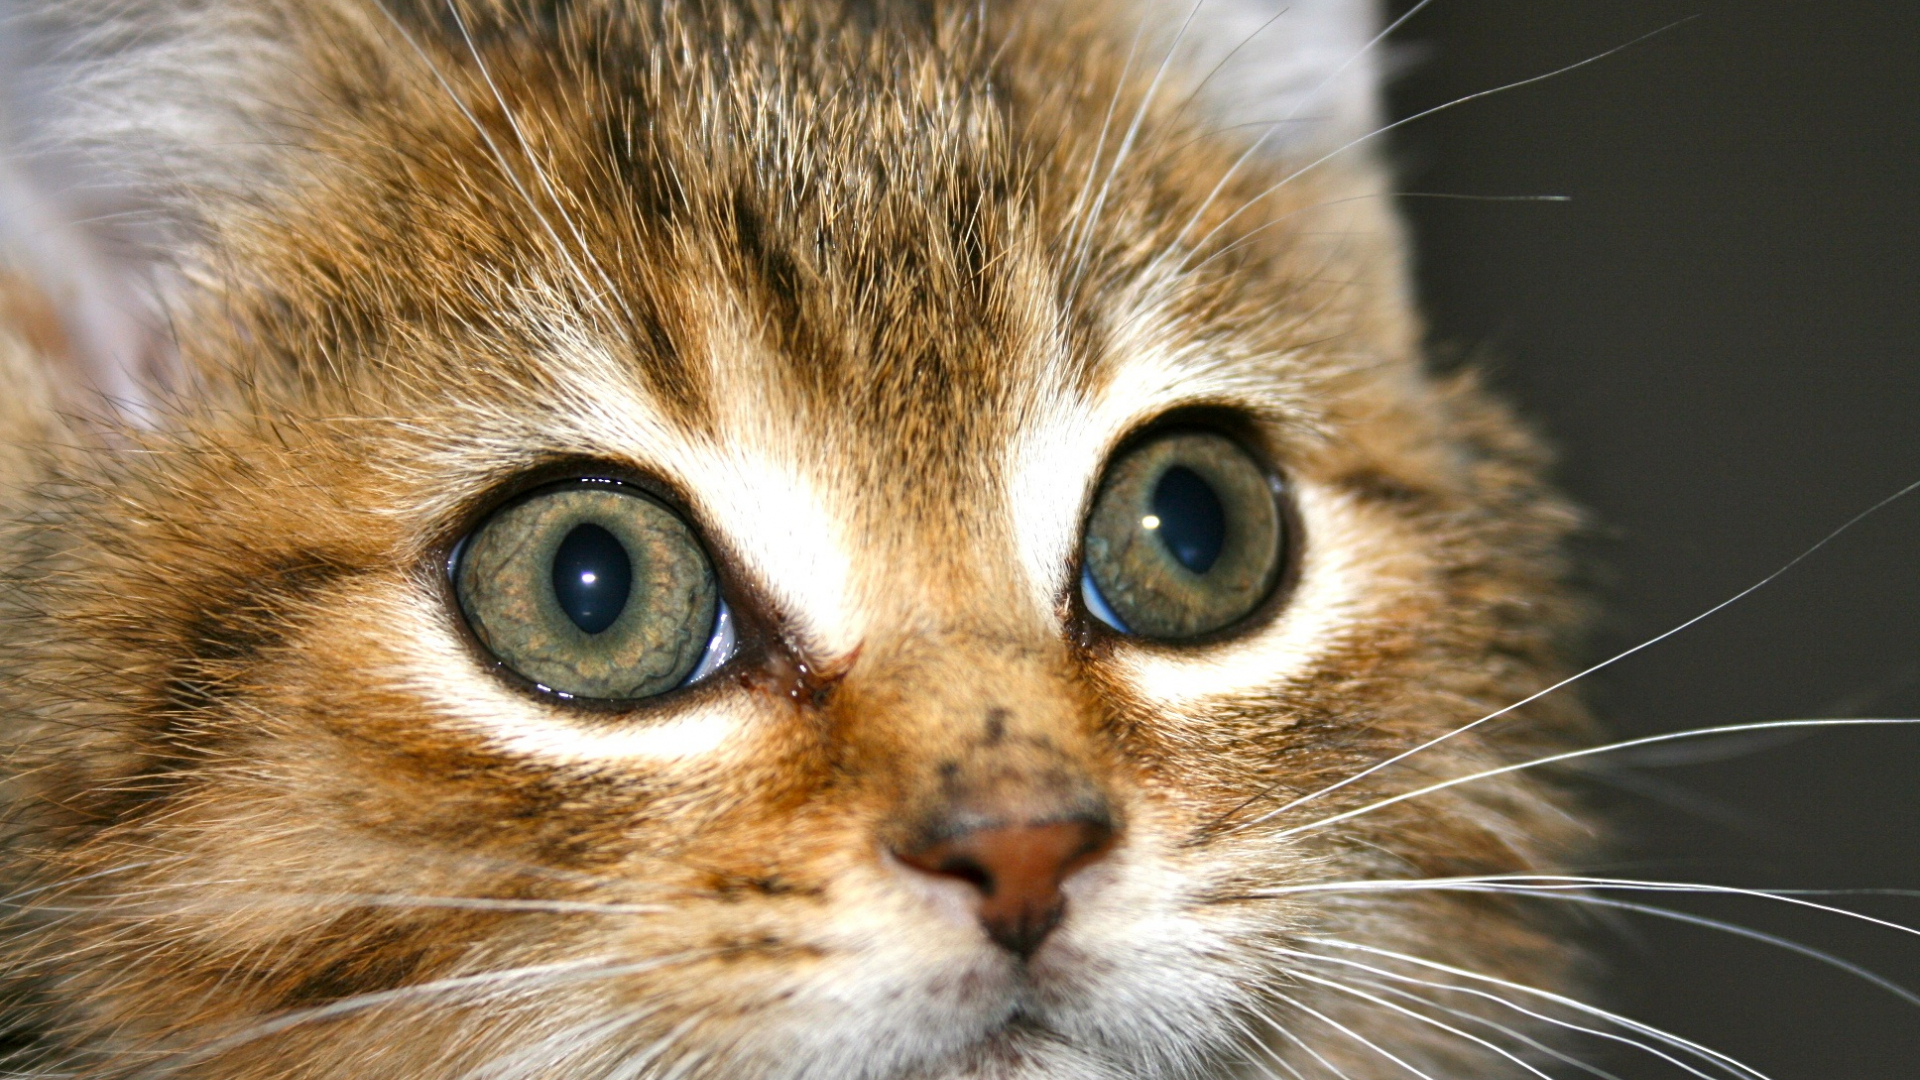 Download 1920x1080 Wallpaper Kitten Small Cat Muzzle Eyes Fur Pet Full Hd Hdtv Fhd 1080p 1920x1080 Hd Image Background 16280